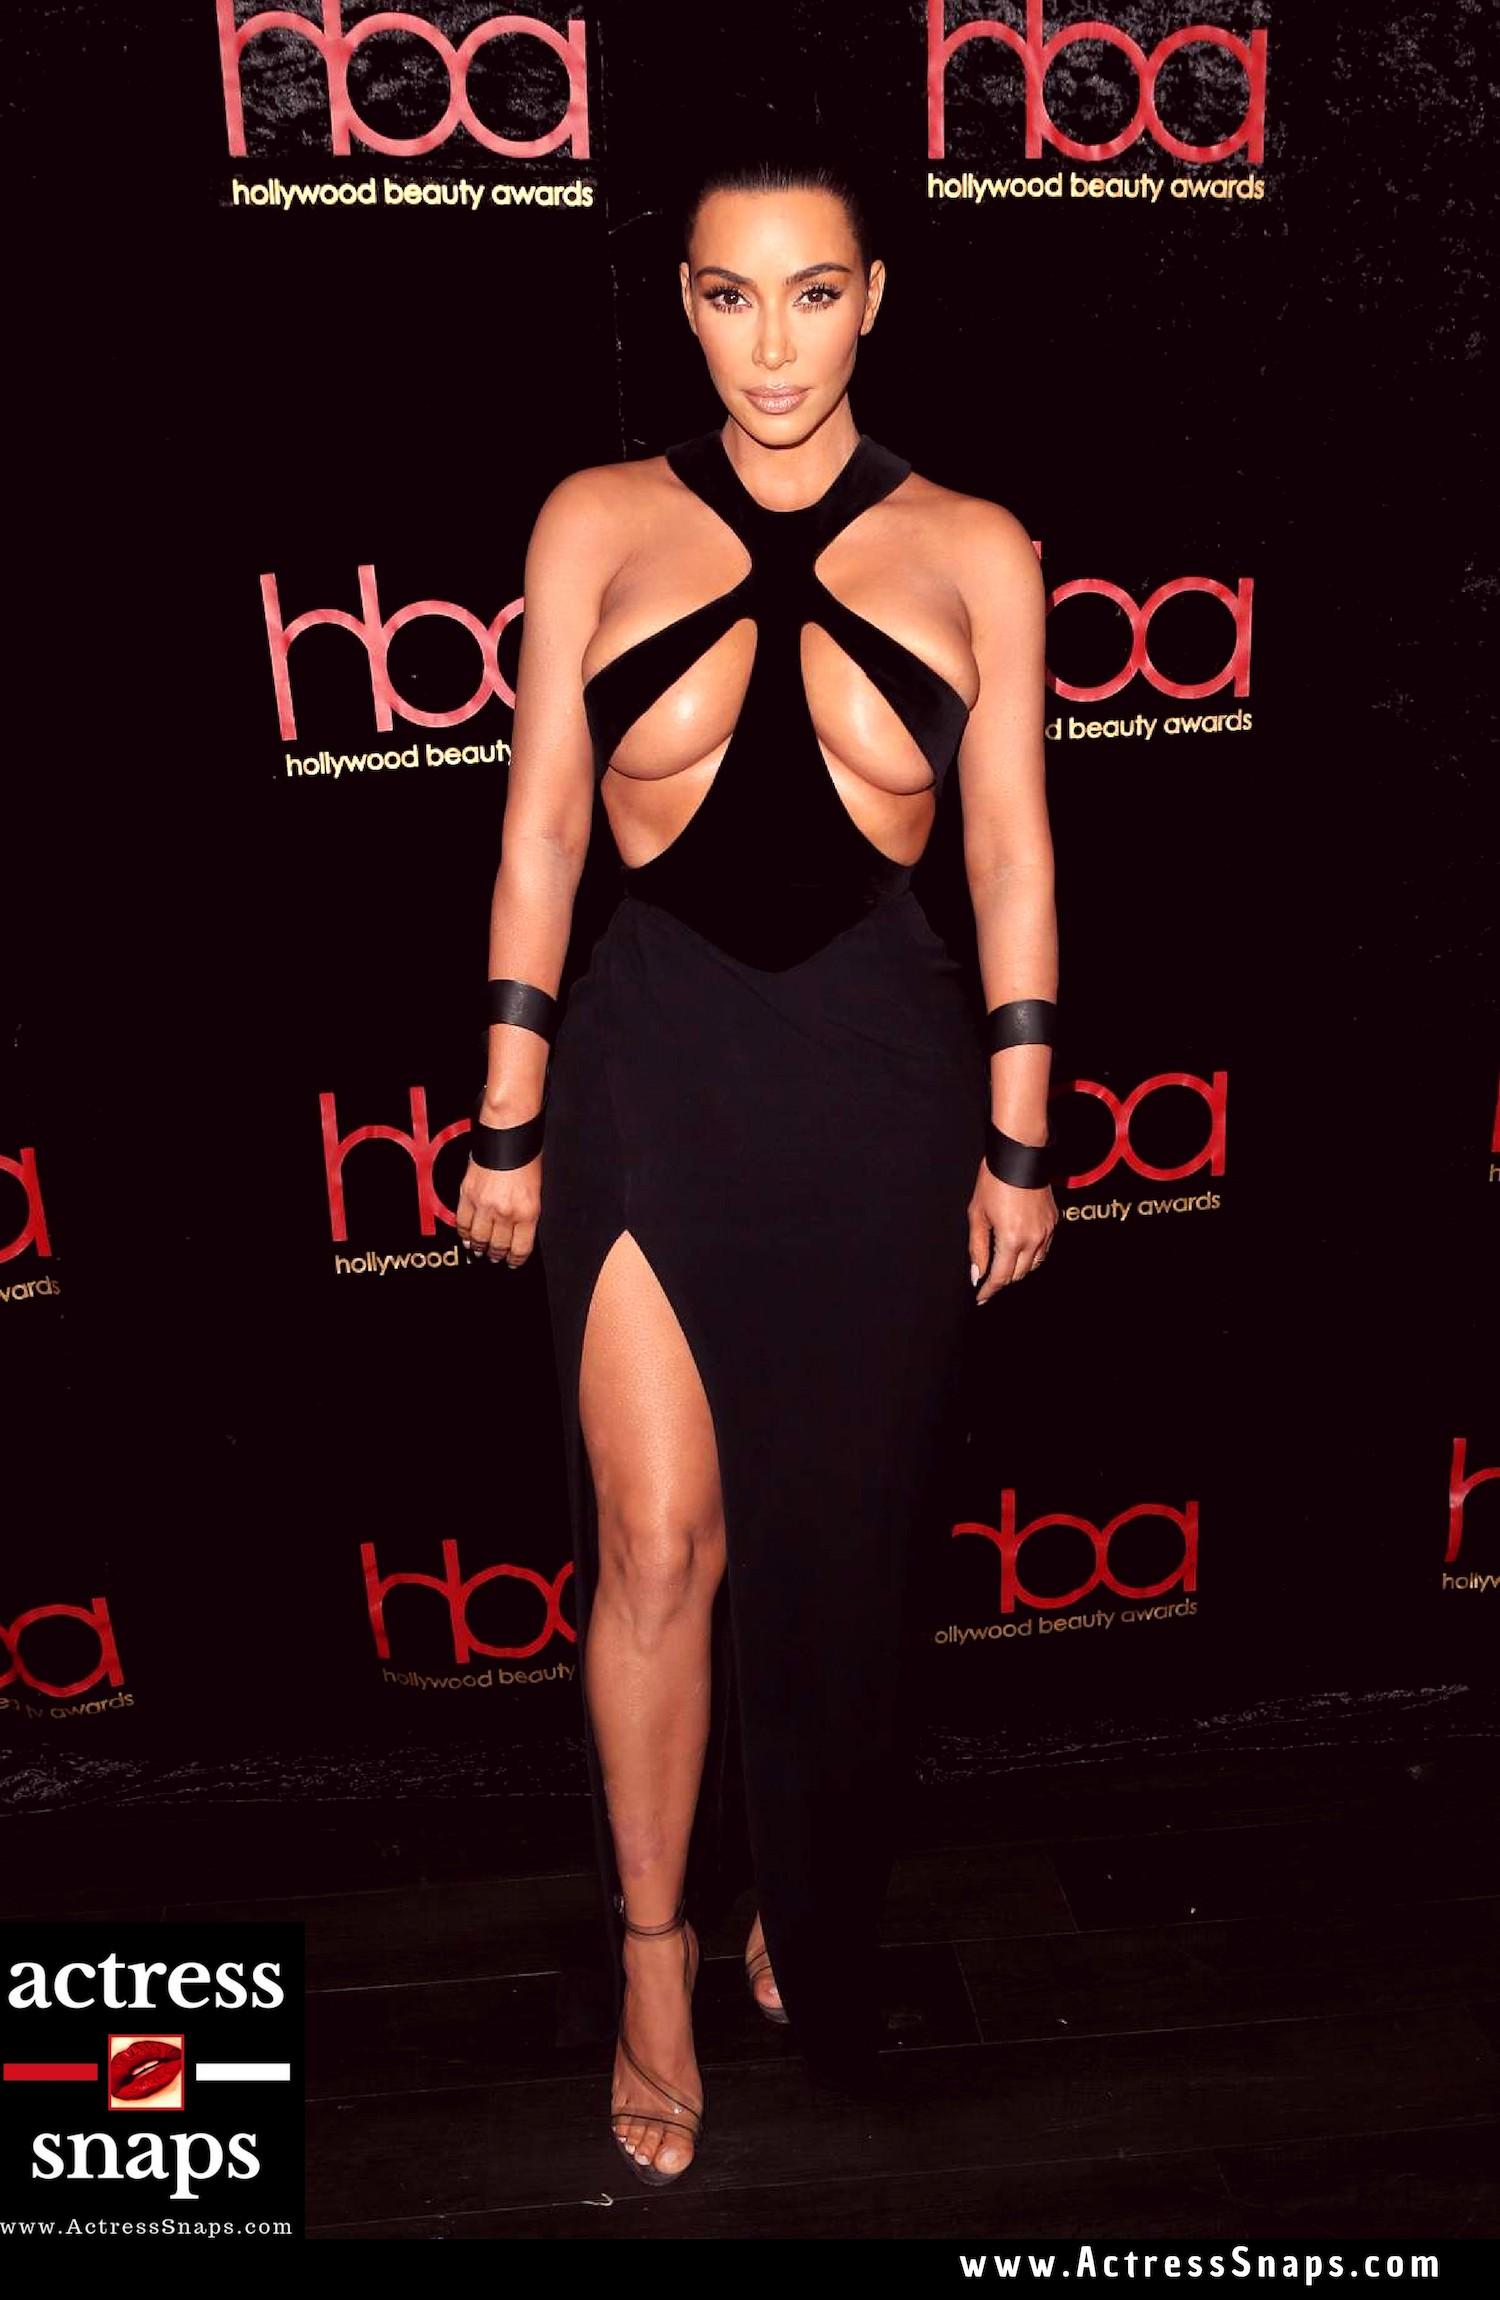 Sexy Kim Kardashian in an Almost Nude Dress - Sexy Actress Pictures | Hot Actress Pictures - ActressSnaps.com